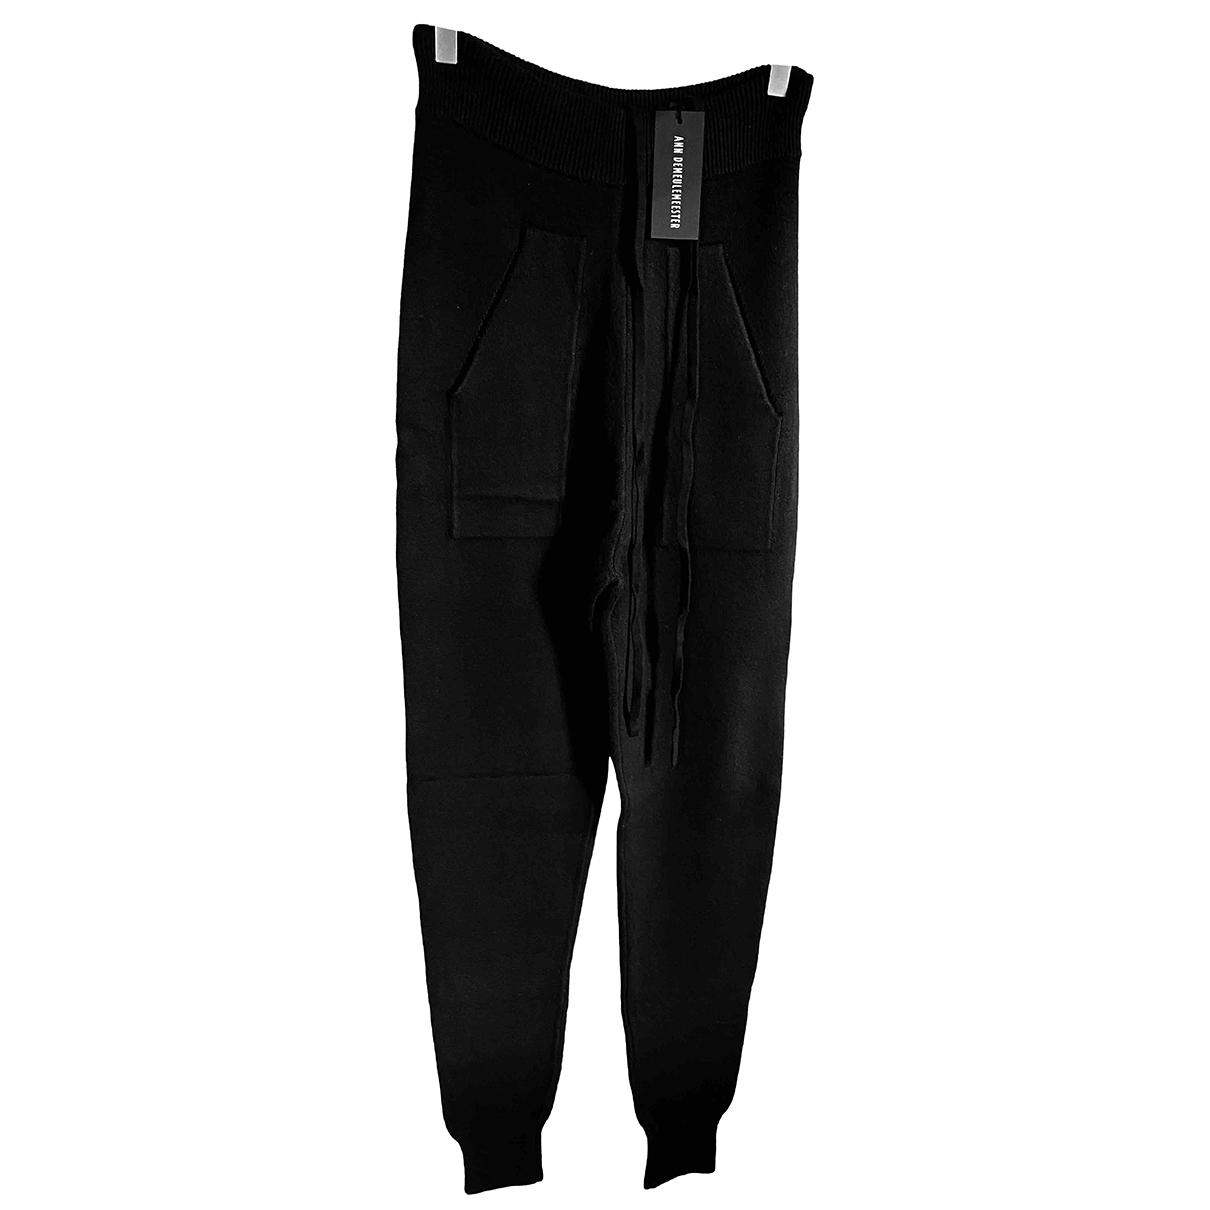 Ann Demeulemeester N Black Cashmere Trousers for Men M International